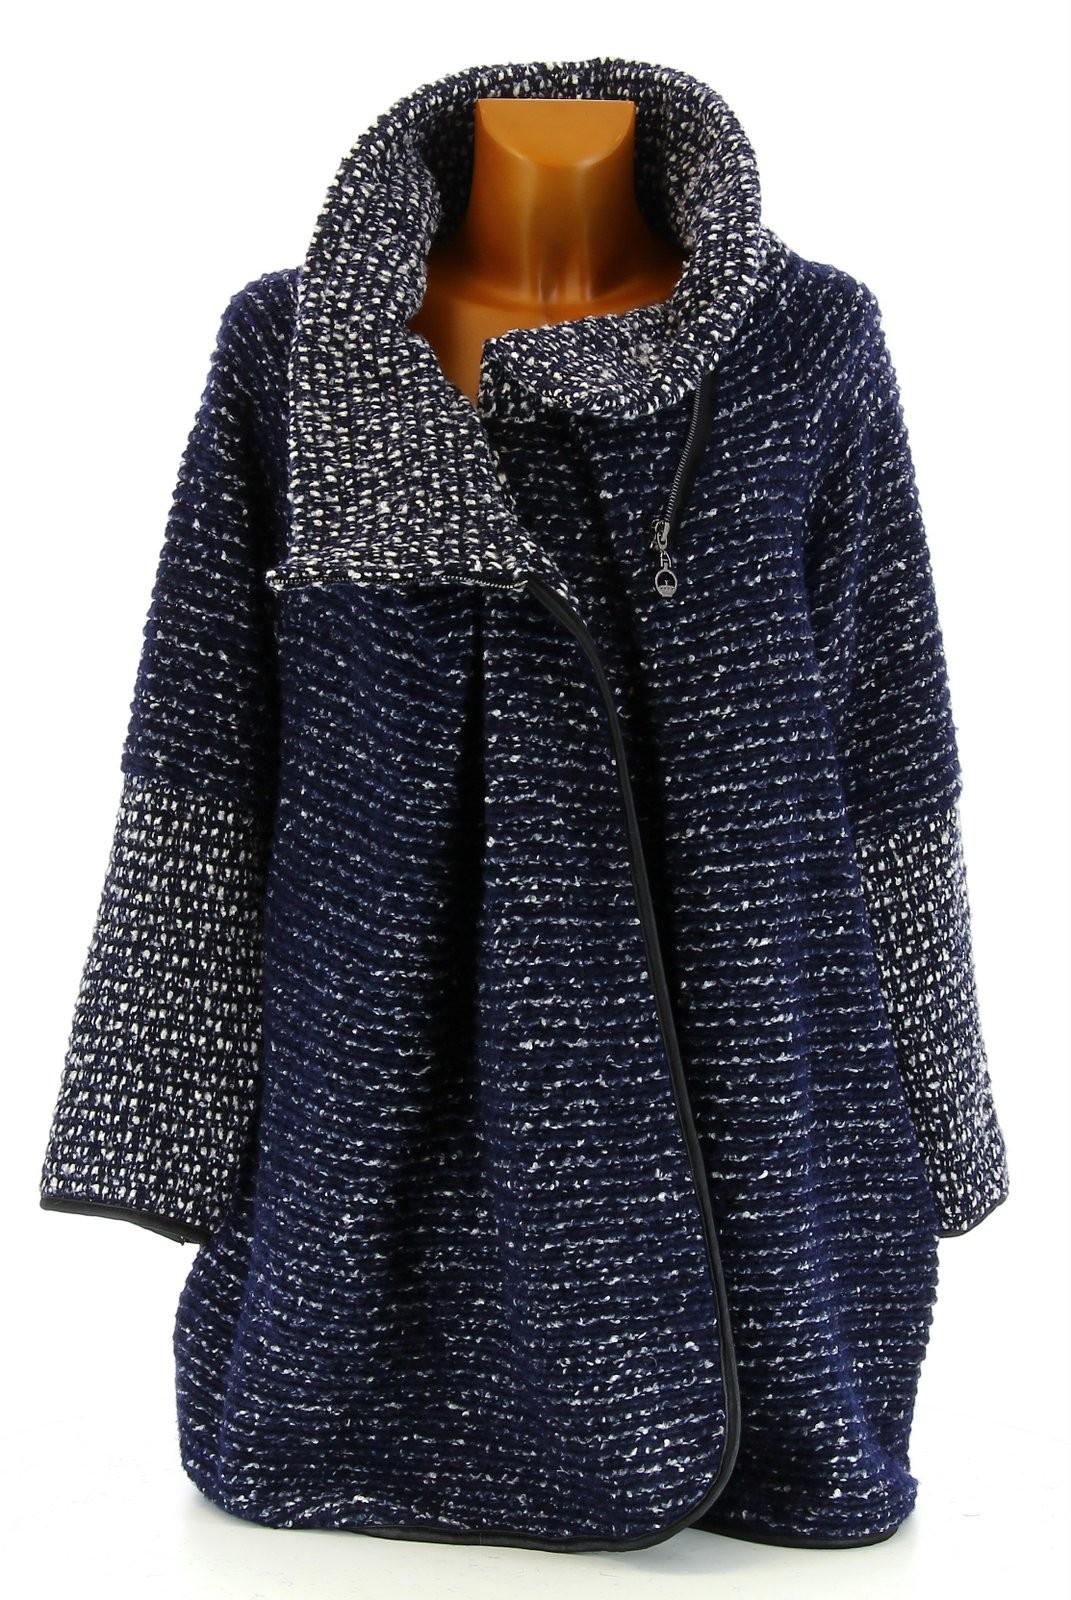 manteau cape laine bouillie hiver grande taille bleu marine violetta bleu ebay. Black Bedroom Furniture Sets. Home Design Ideas